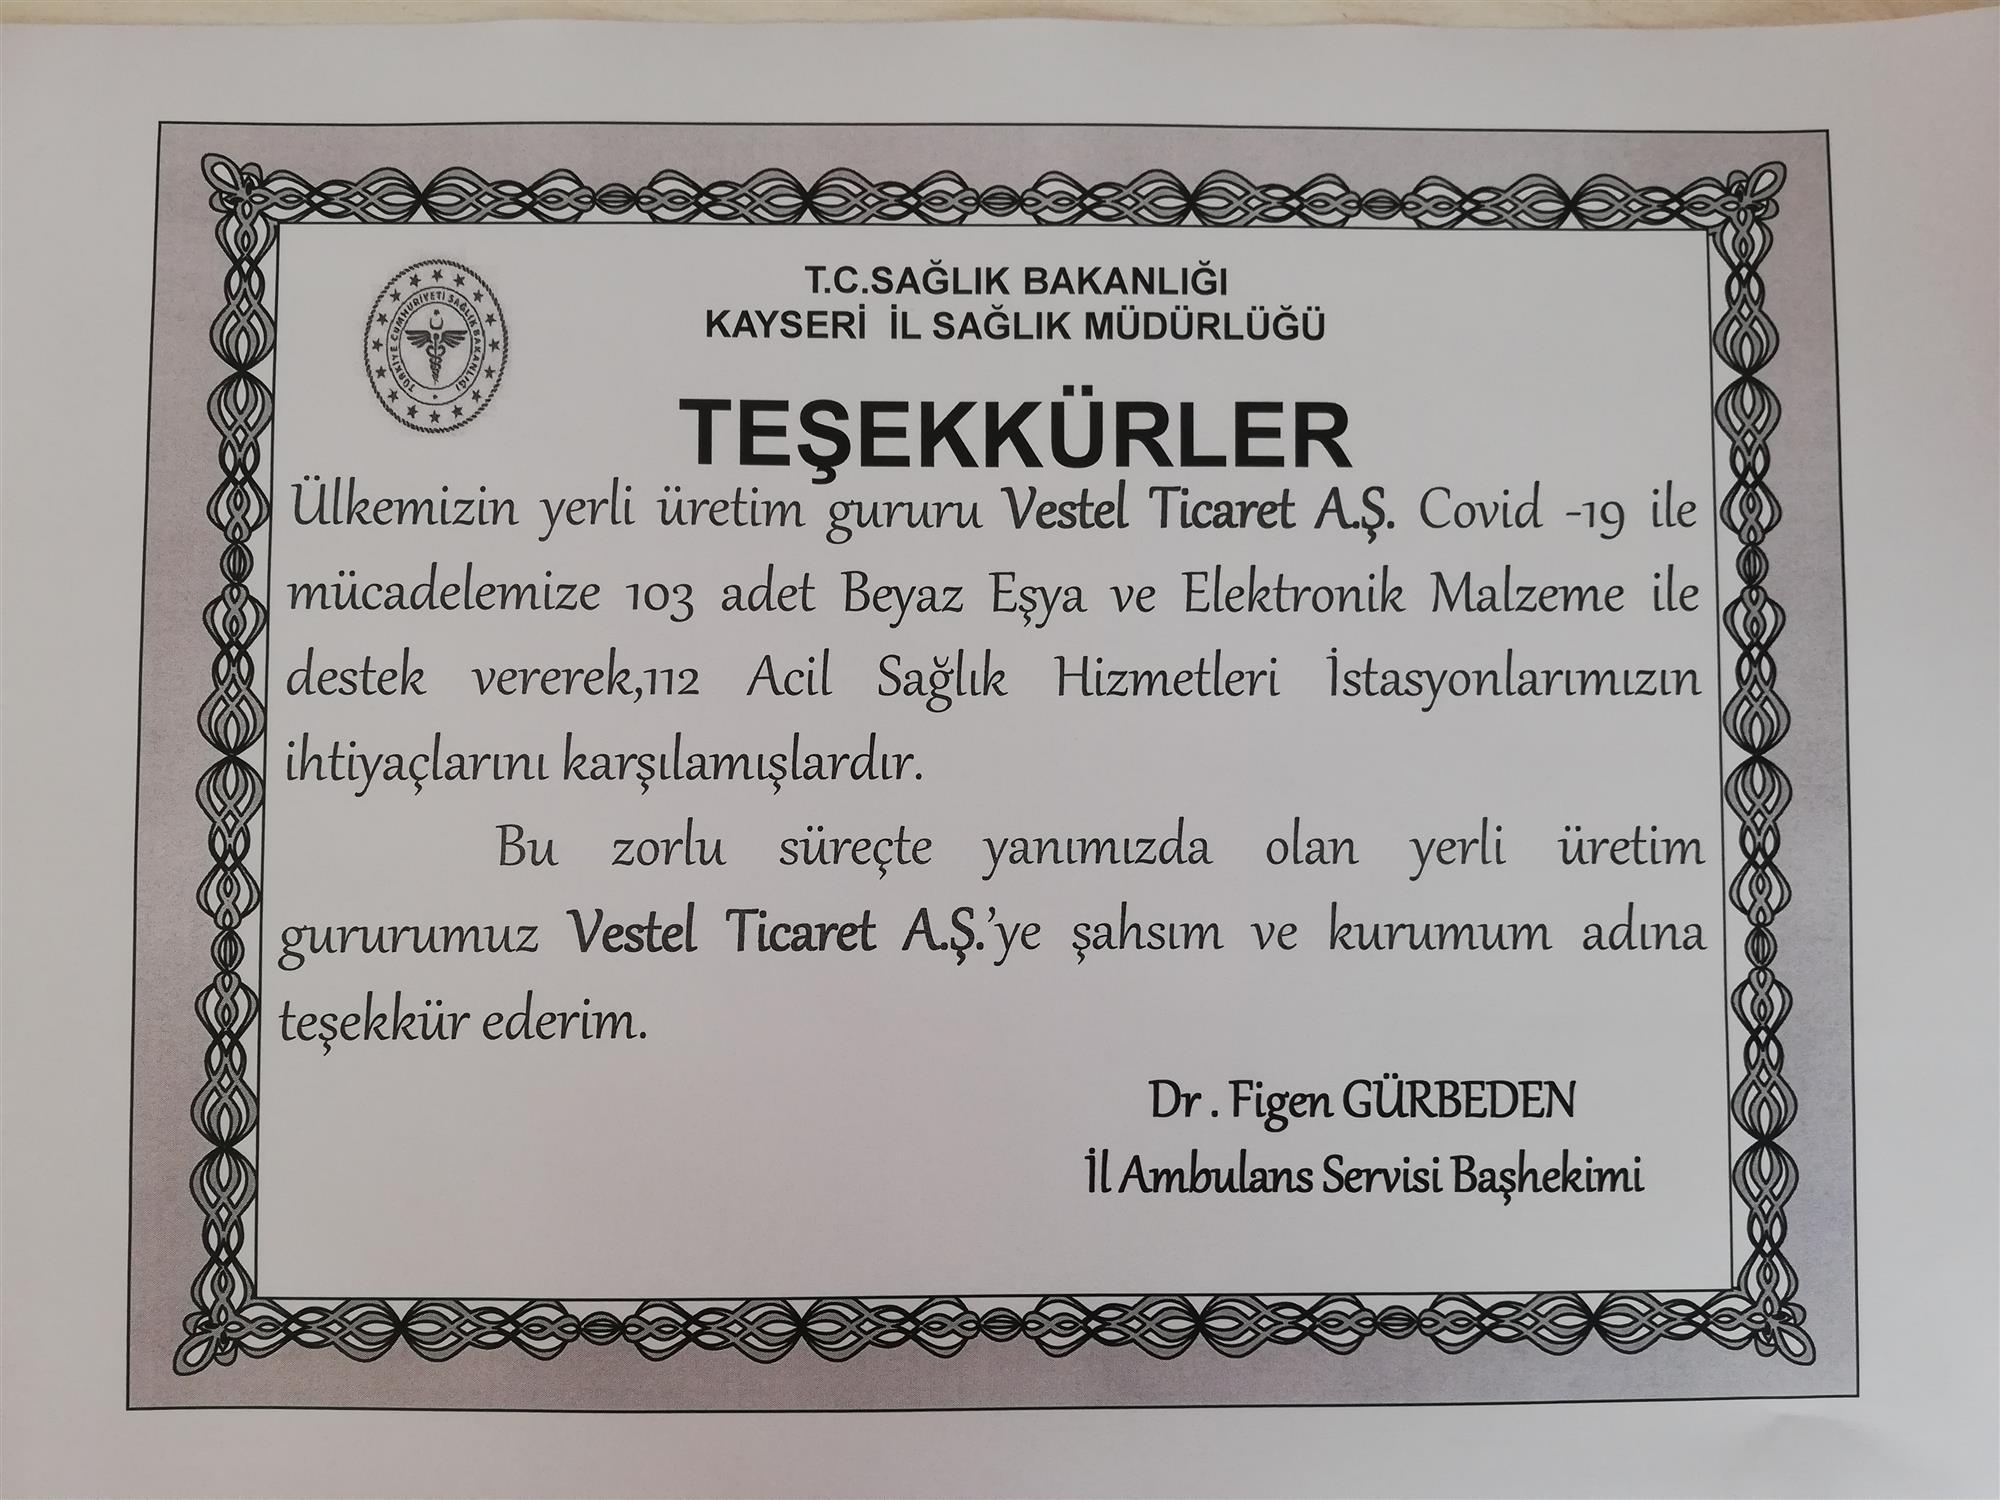 TEŞEKKÜRLER Vestel Ticaret  A.Ş.